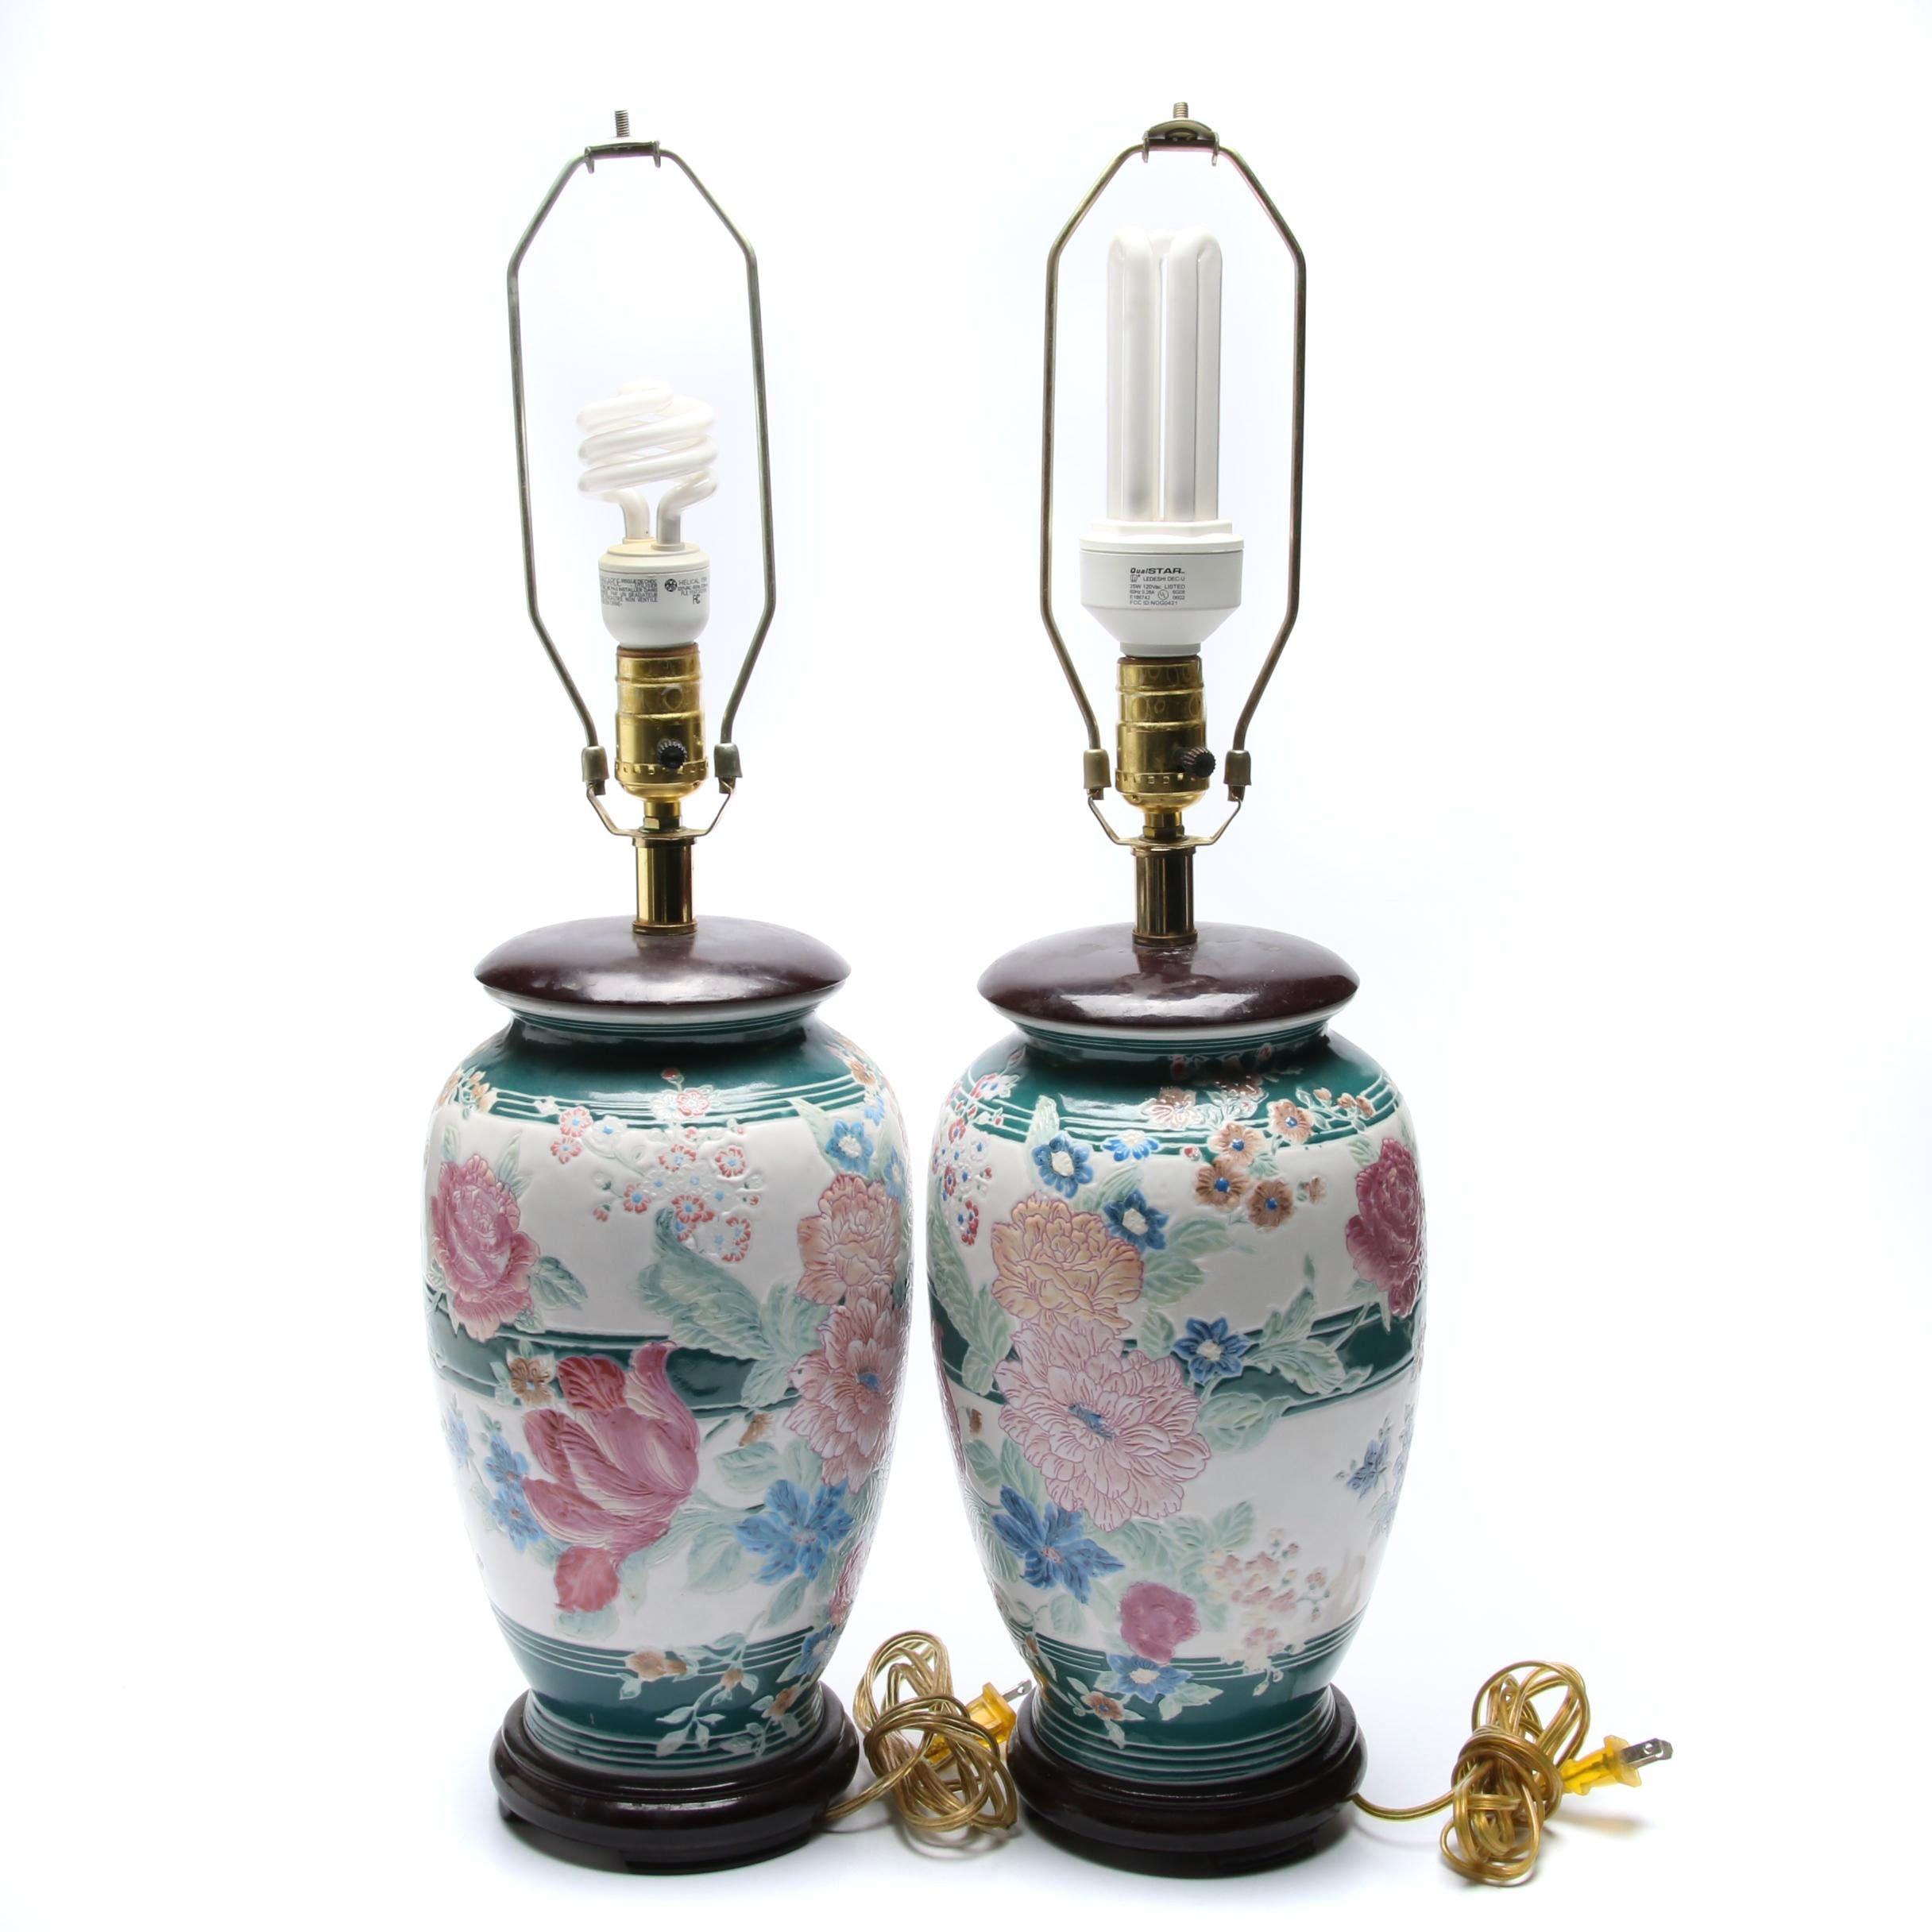 Pairing of Hand Decorated Ceramic Urn Lamps